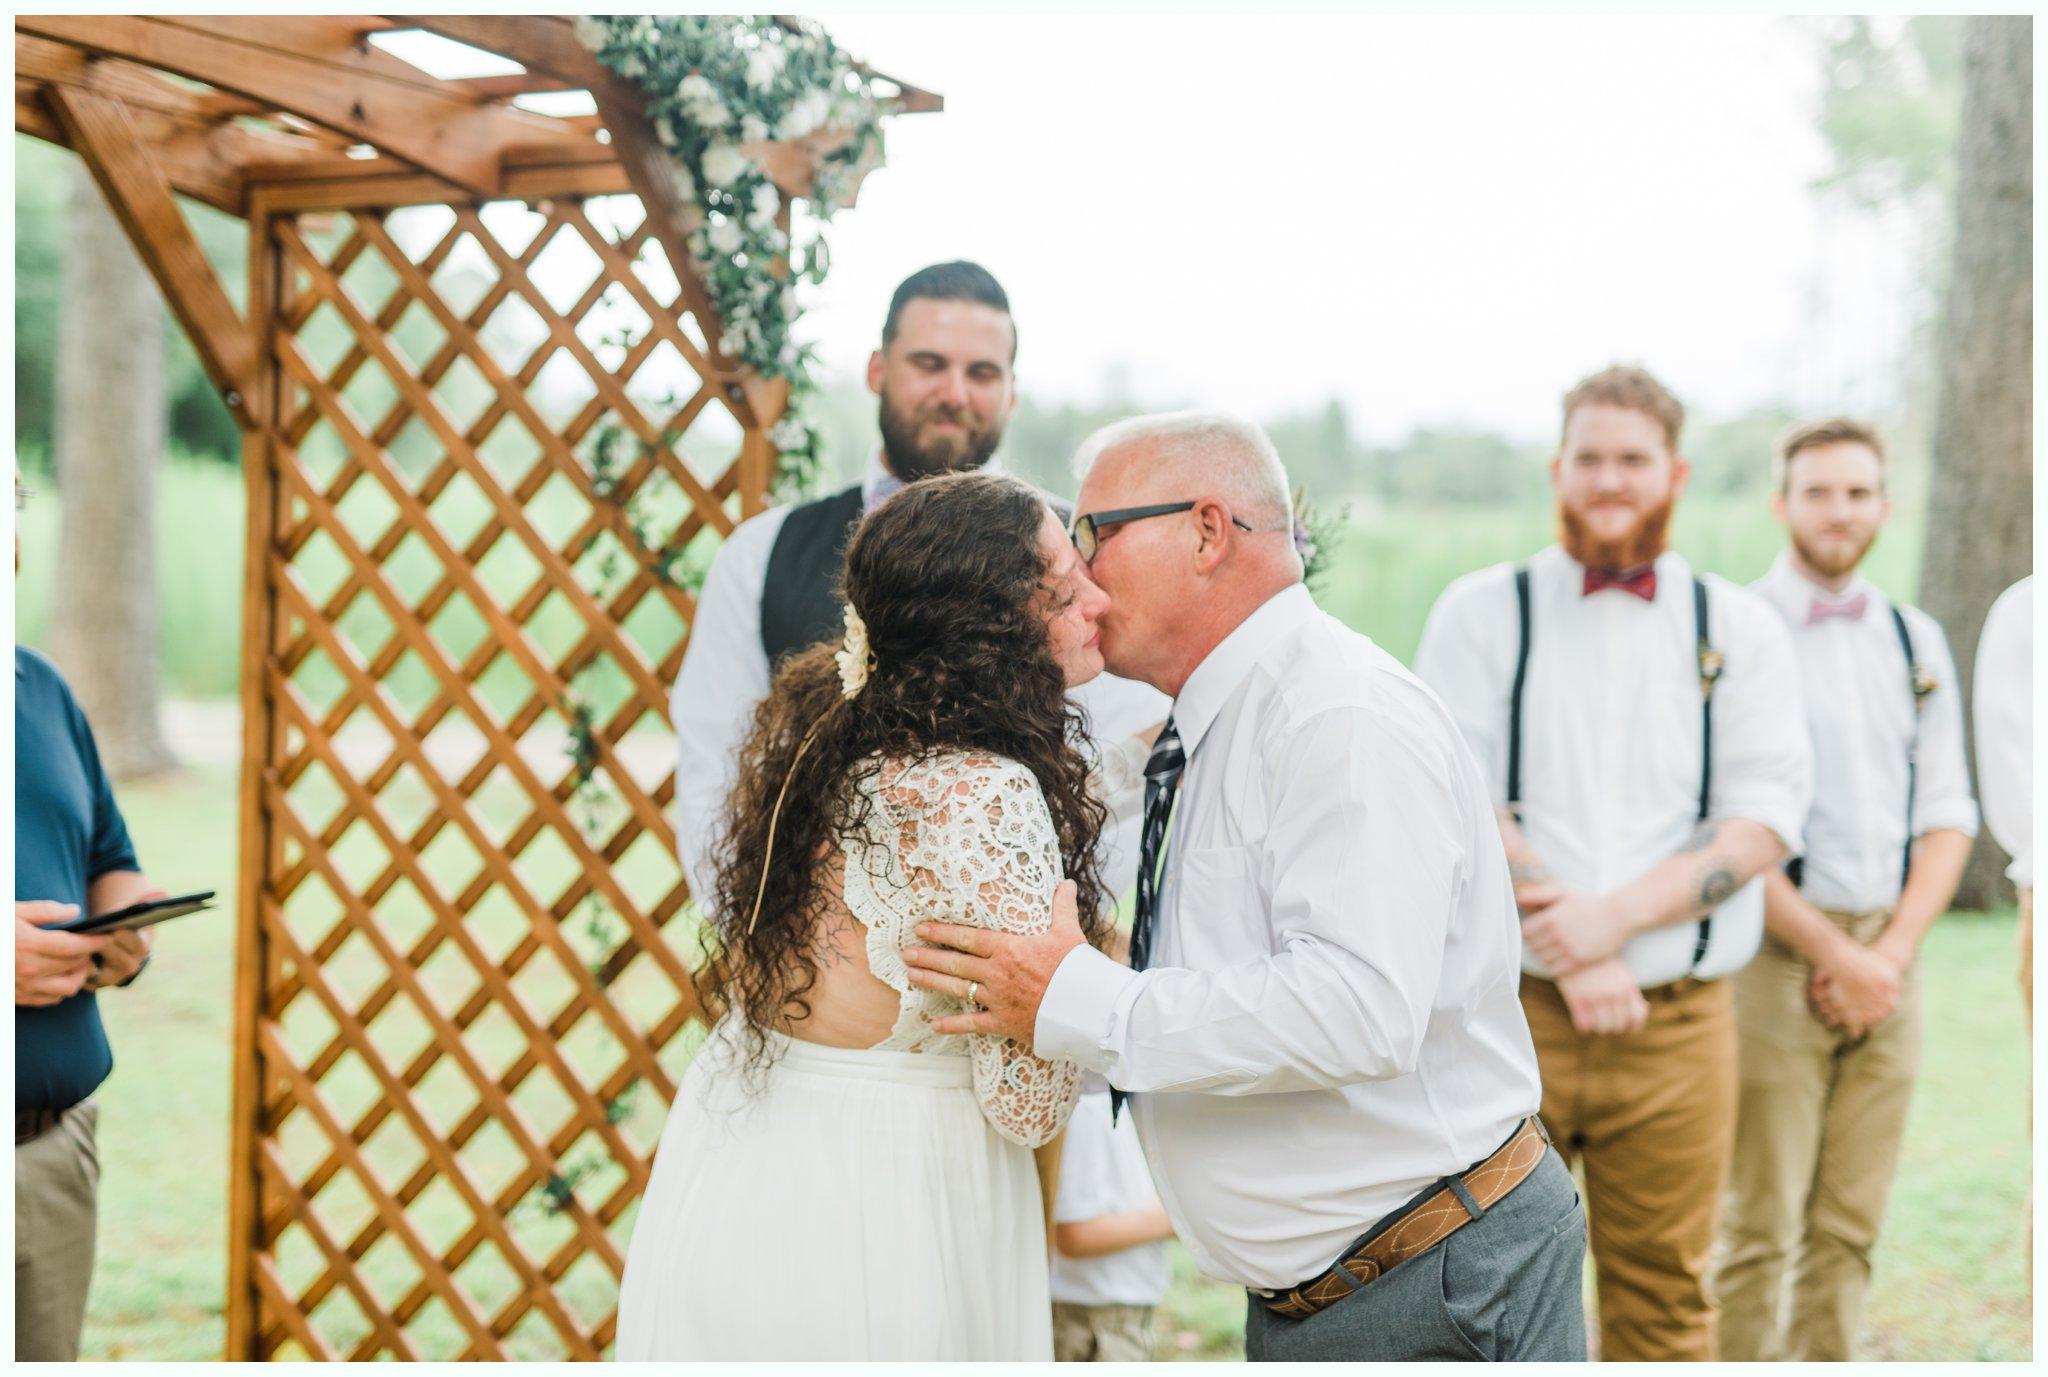 Jake&rhondawedding_5212.jpg